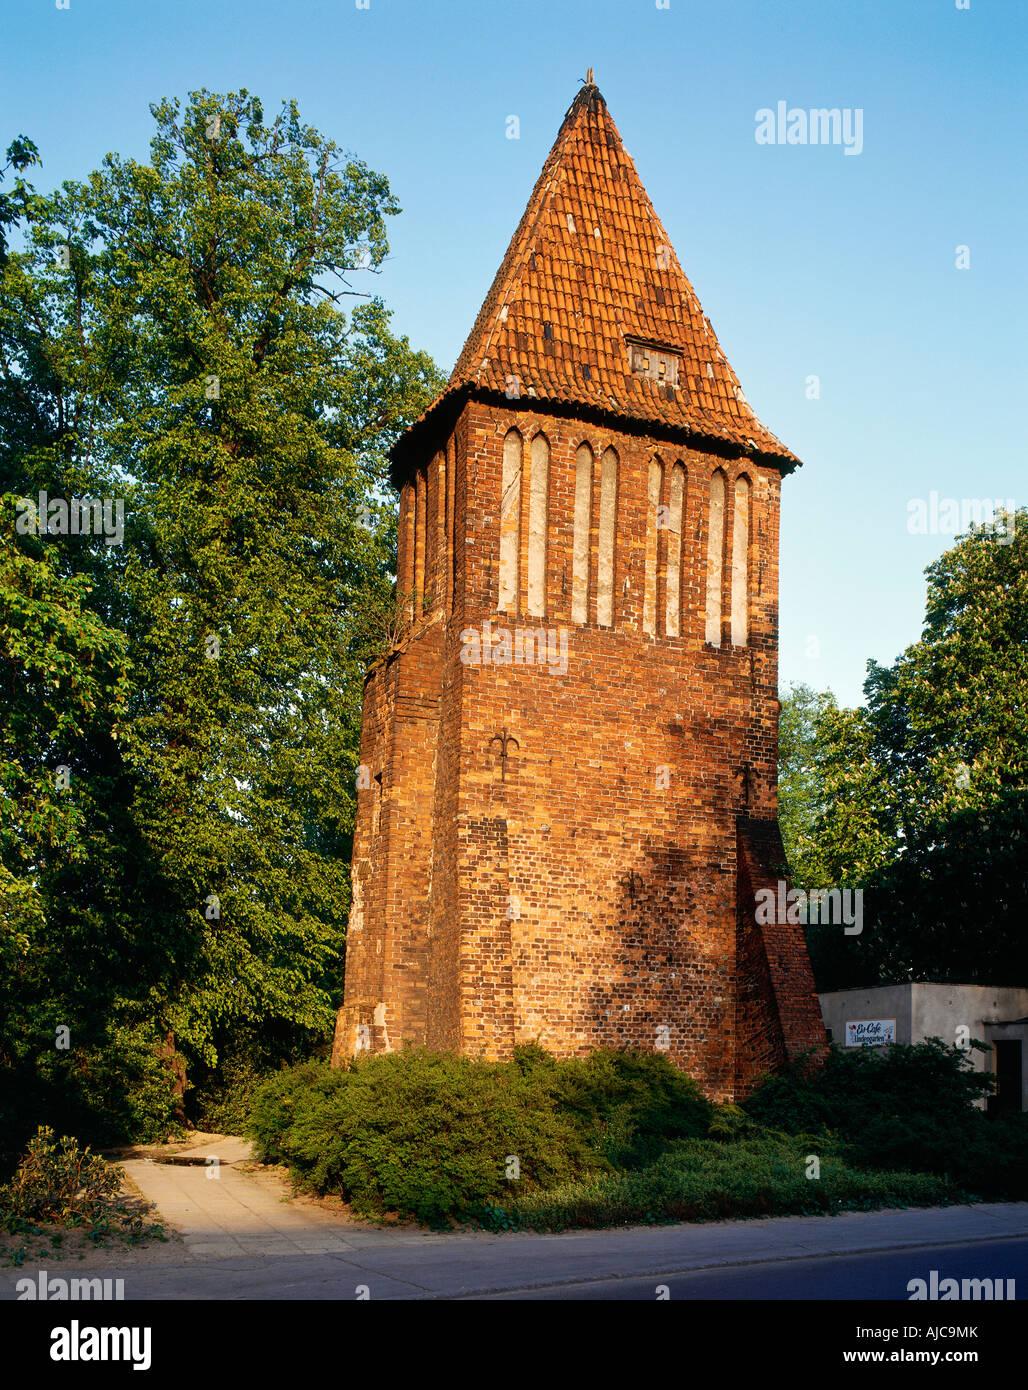 Nikolaikirche aussen Giebel der südlichen Seitenhalle Wismar   Nikolai church exterior view gable of the southern - Stock Image